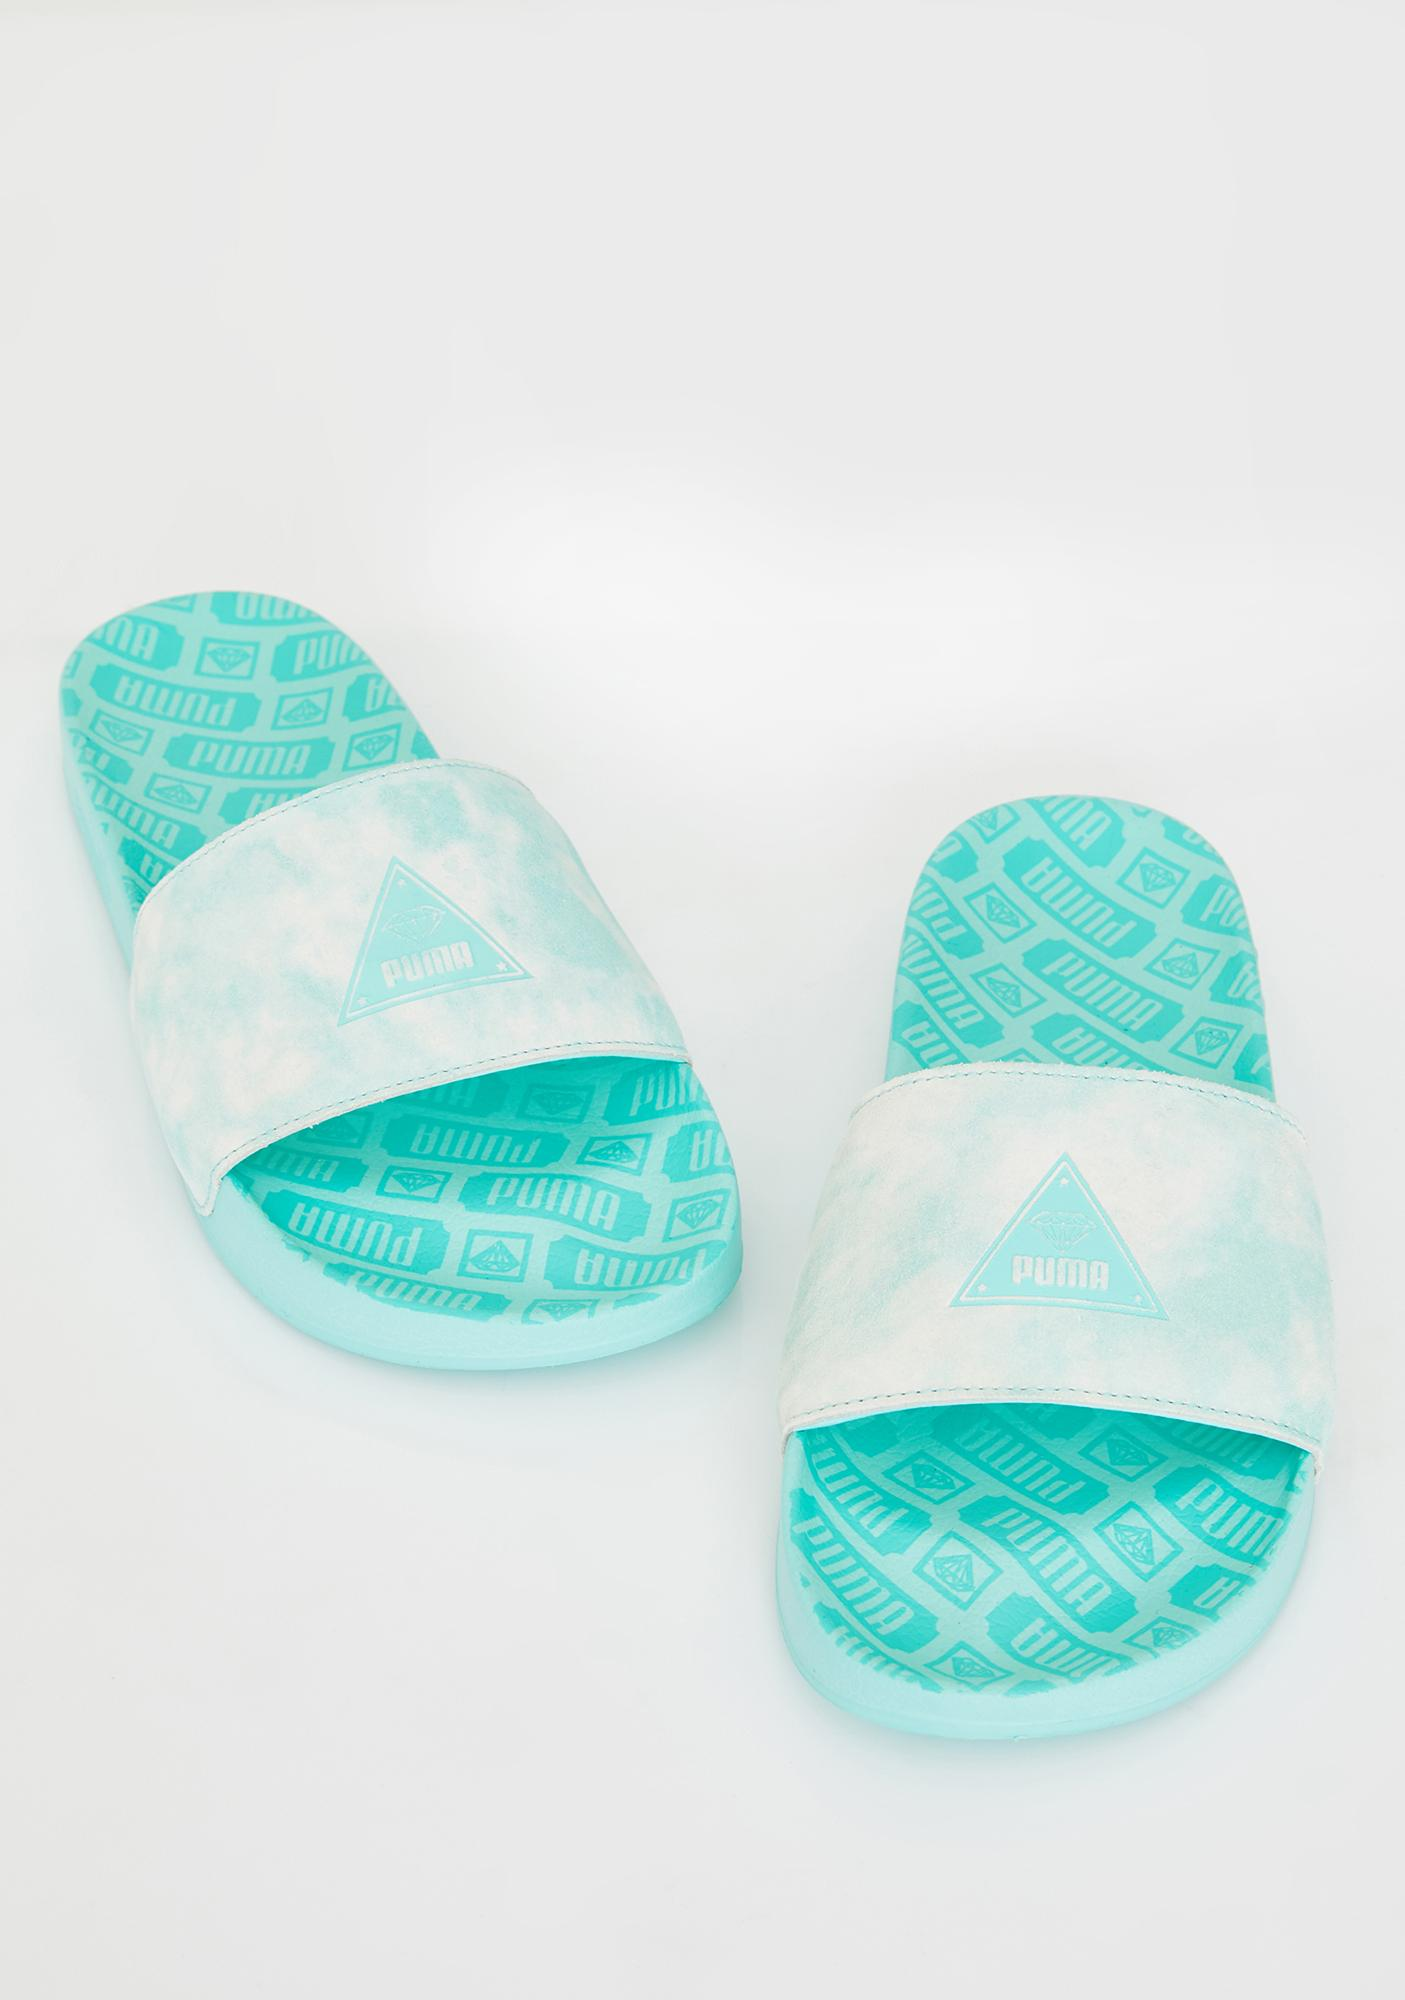 PUMA X Diamond Supply Co. Leadcat Slides